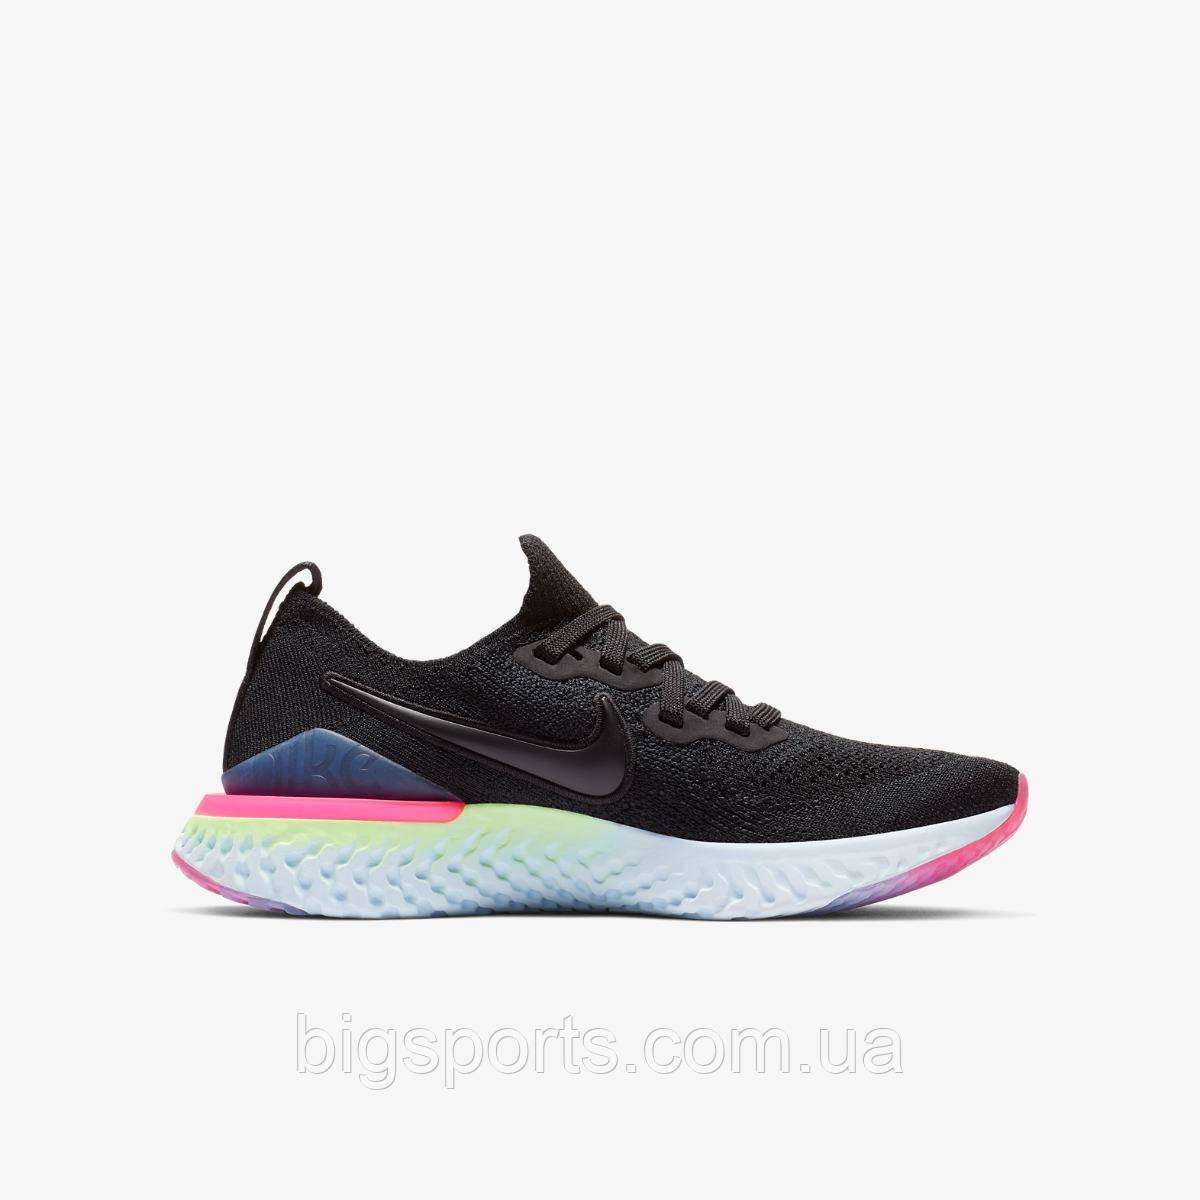 Кроссовки дет. Nike Epic React Flyknit 2 (GS) (арт. AQ3243-003)